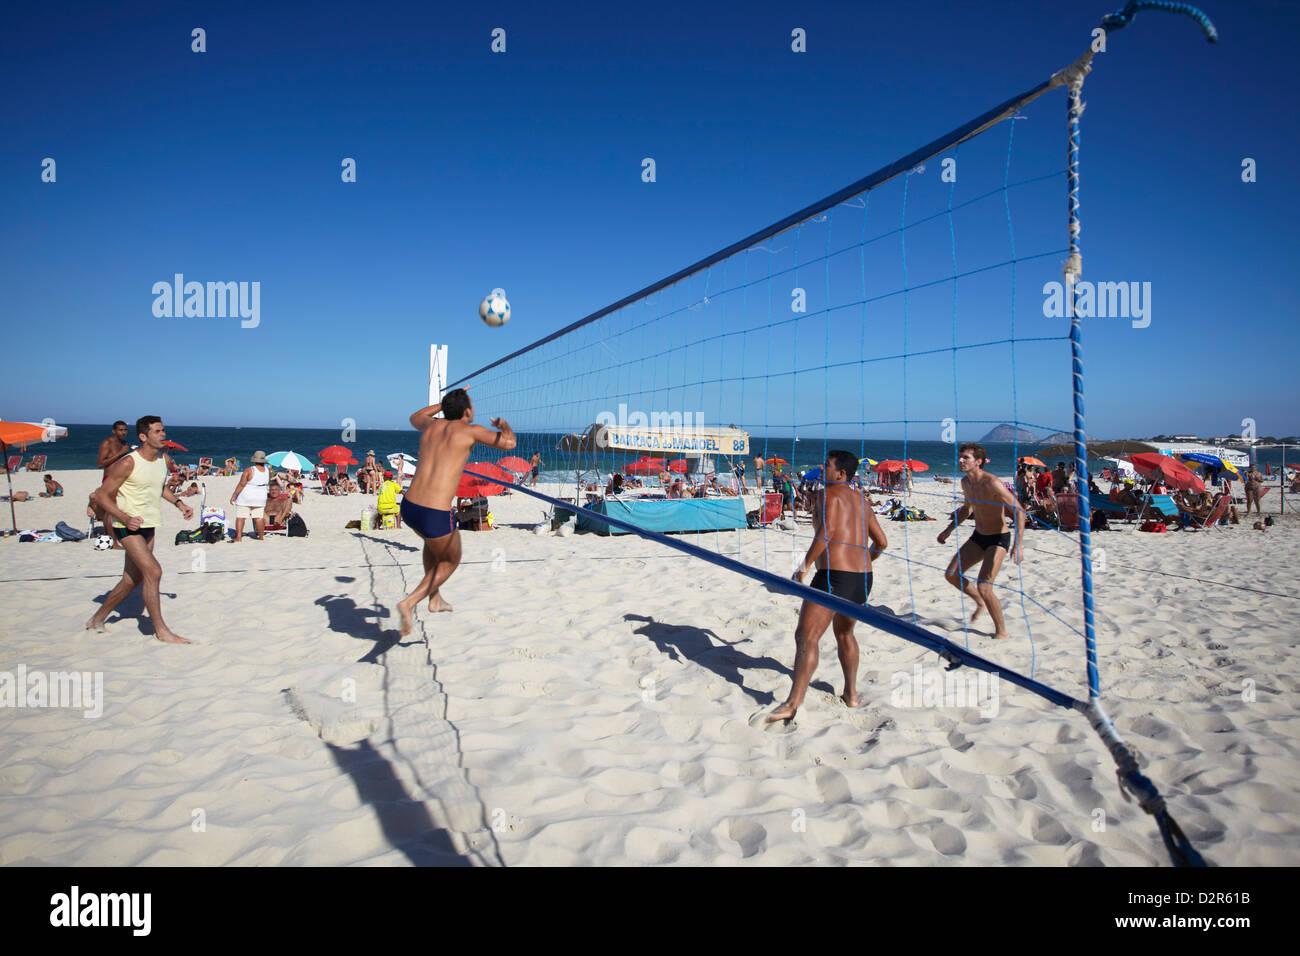 Men playing foot volley (futevolei) on Copacabana beach, Rio de Janeiro, Brazil, South America - Stock Image